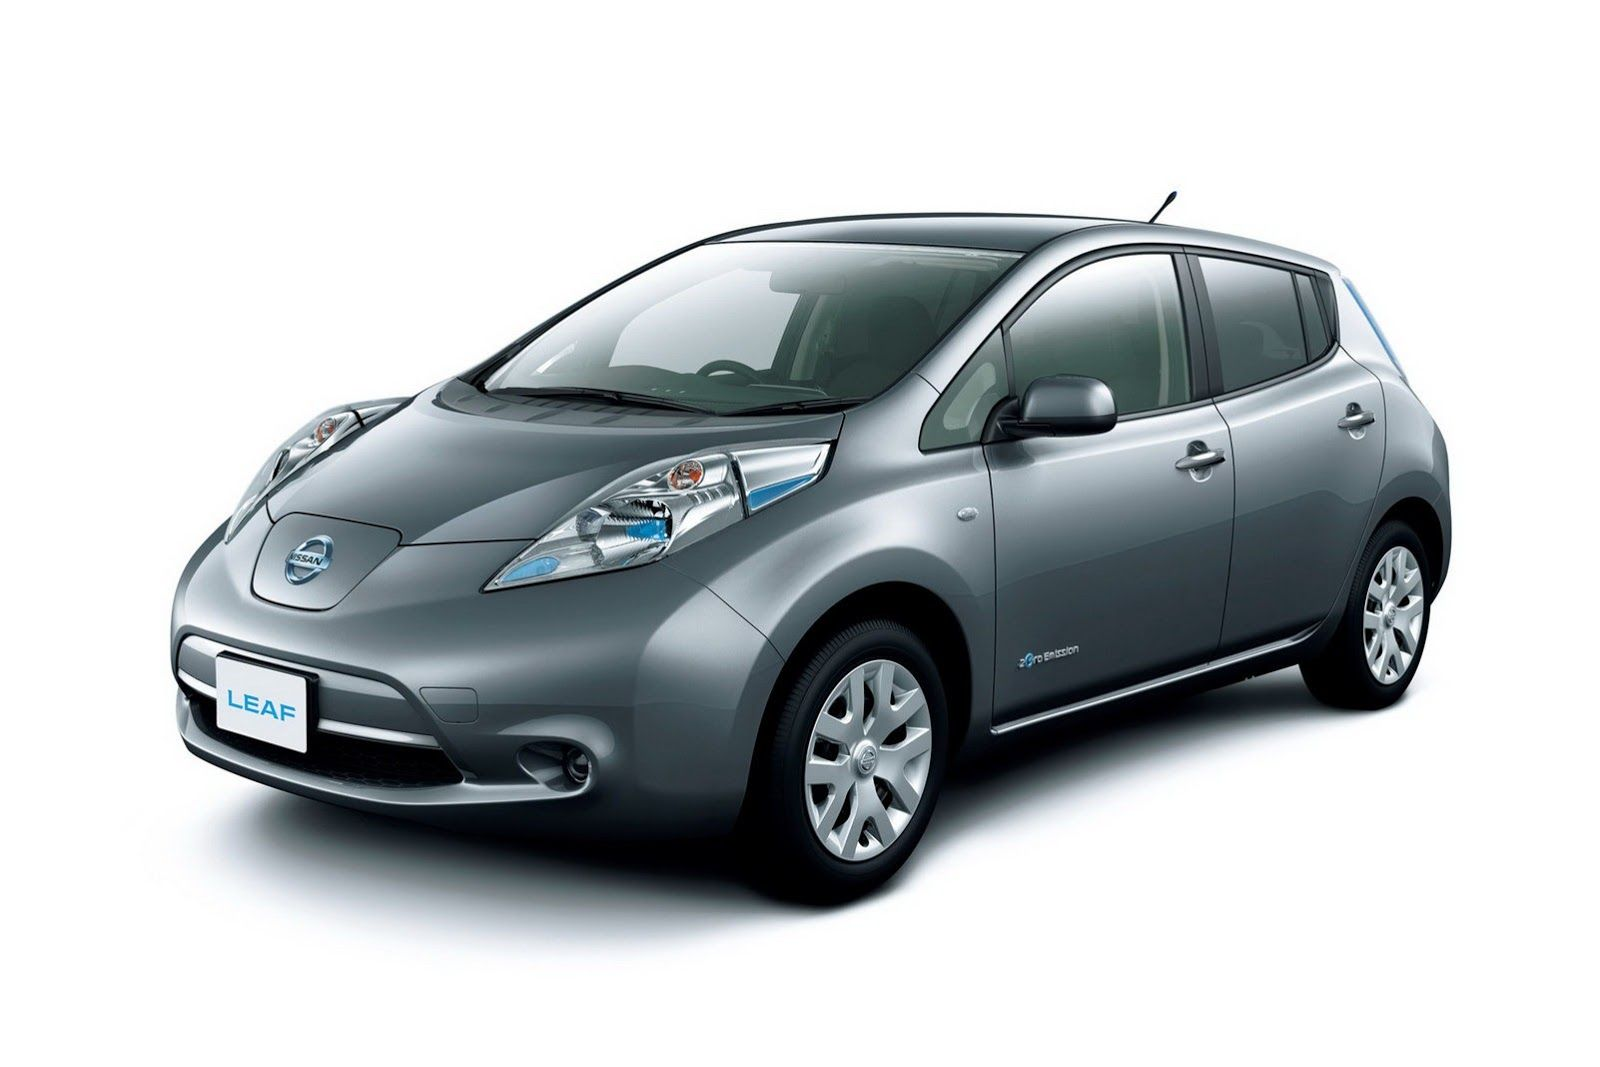 2013 #Nissan LEAF EV